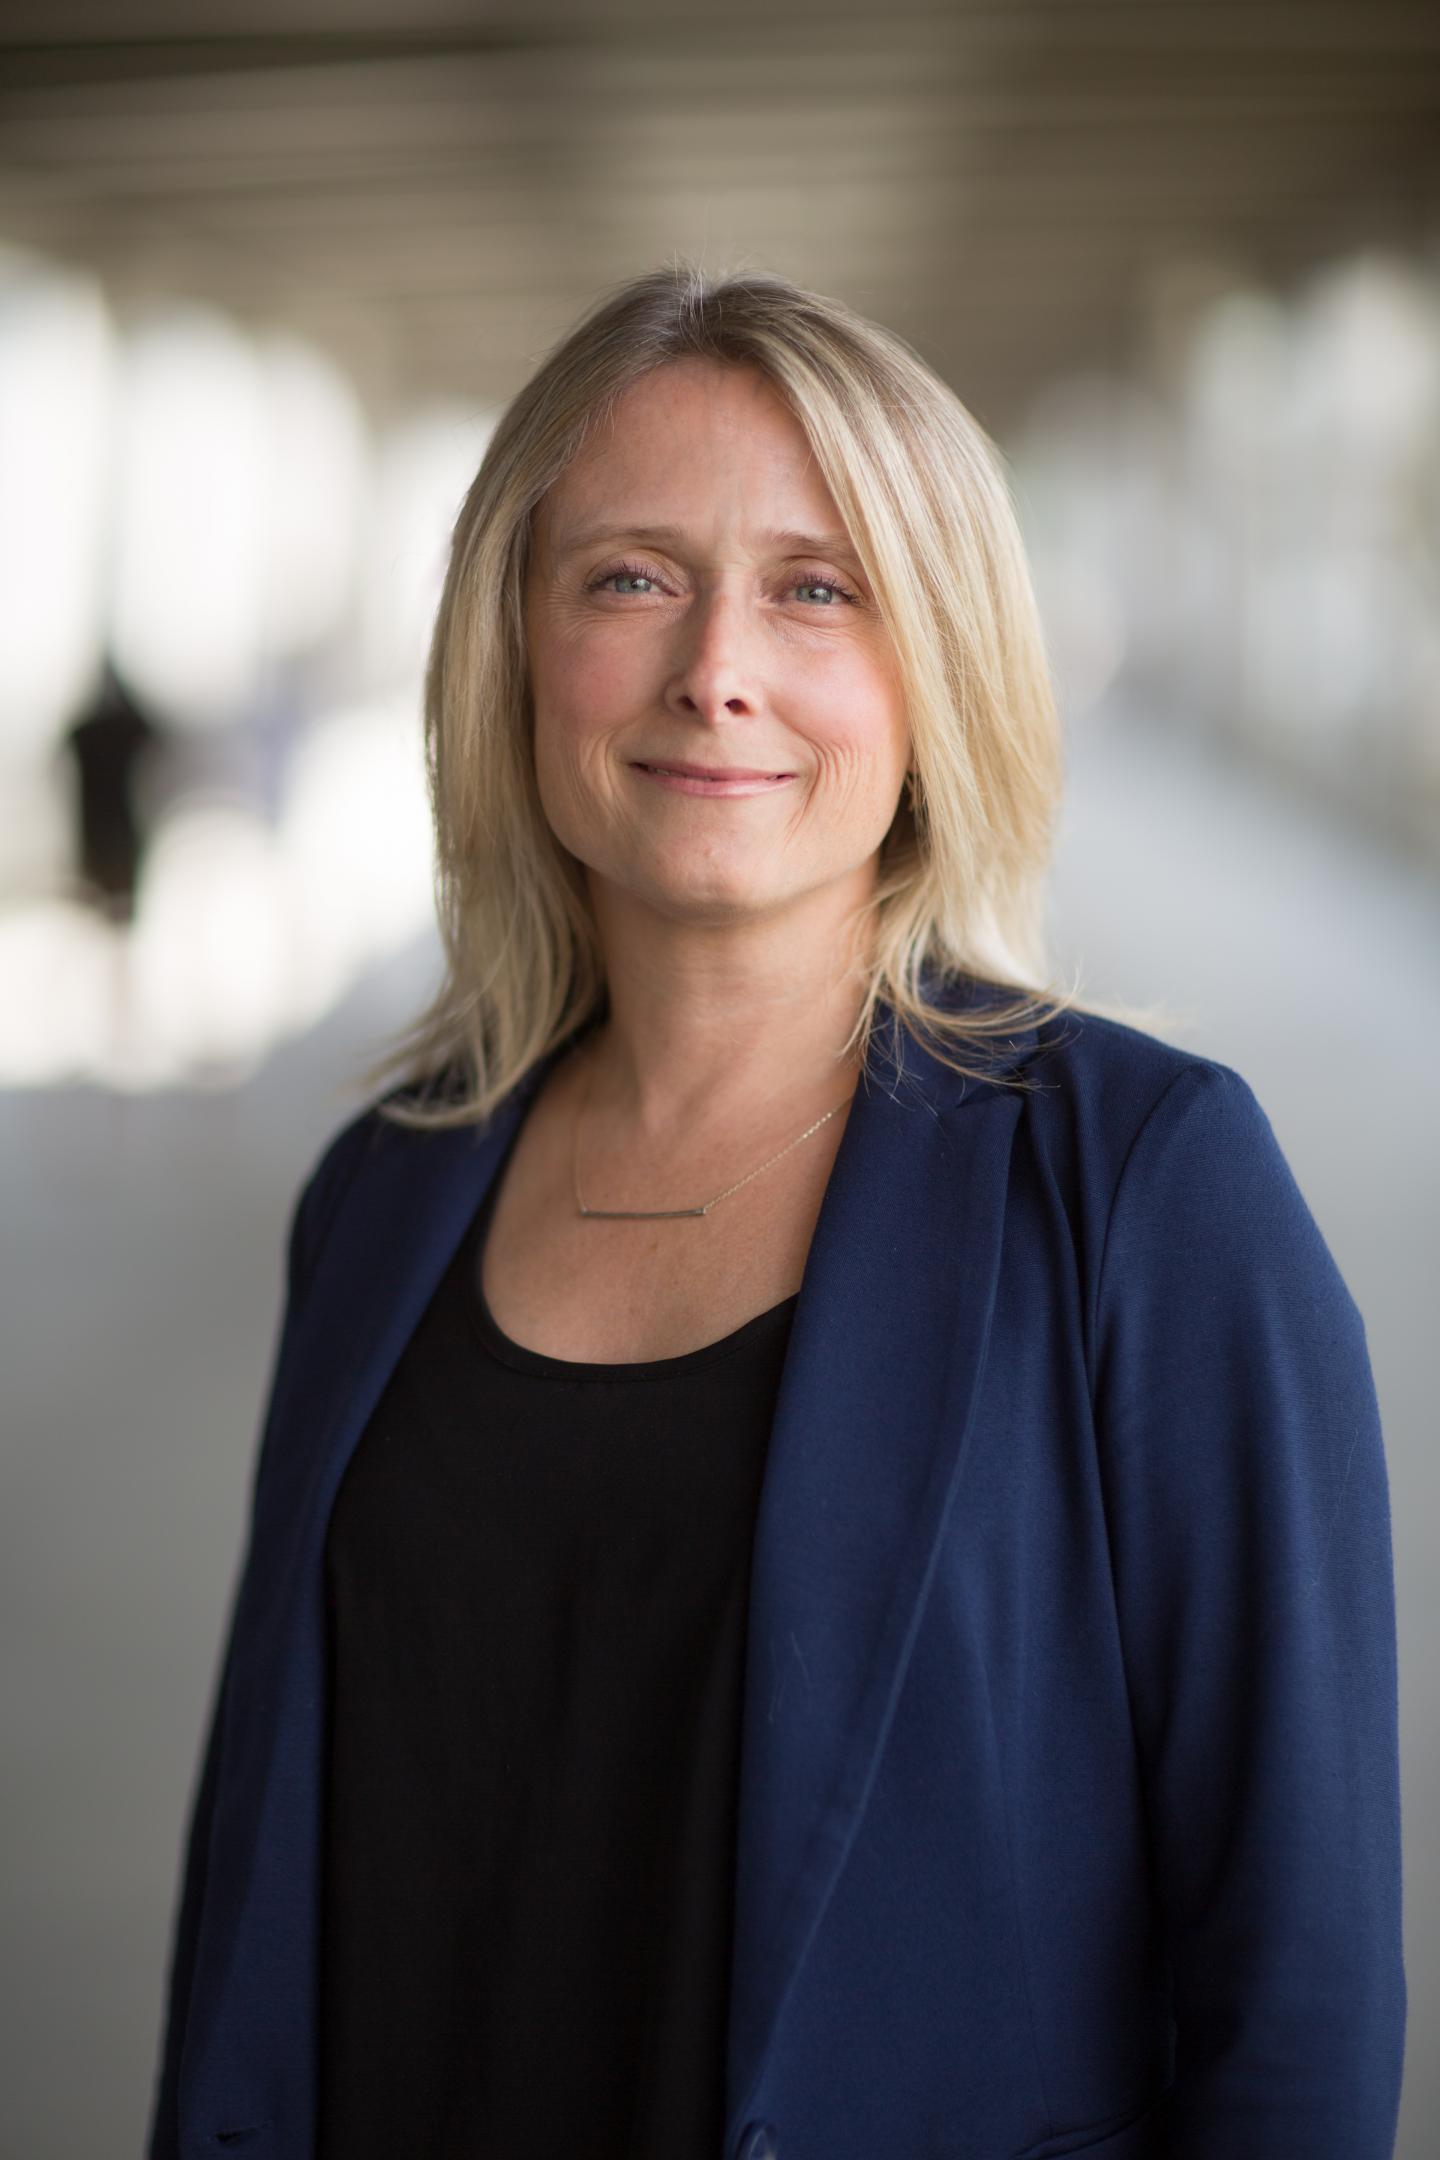 Melissa Troester, Ph.D., UNC Lineberger Comprehensive Cancer Center